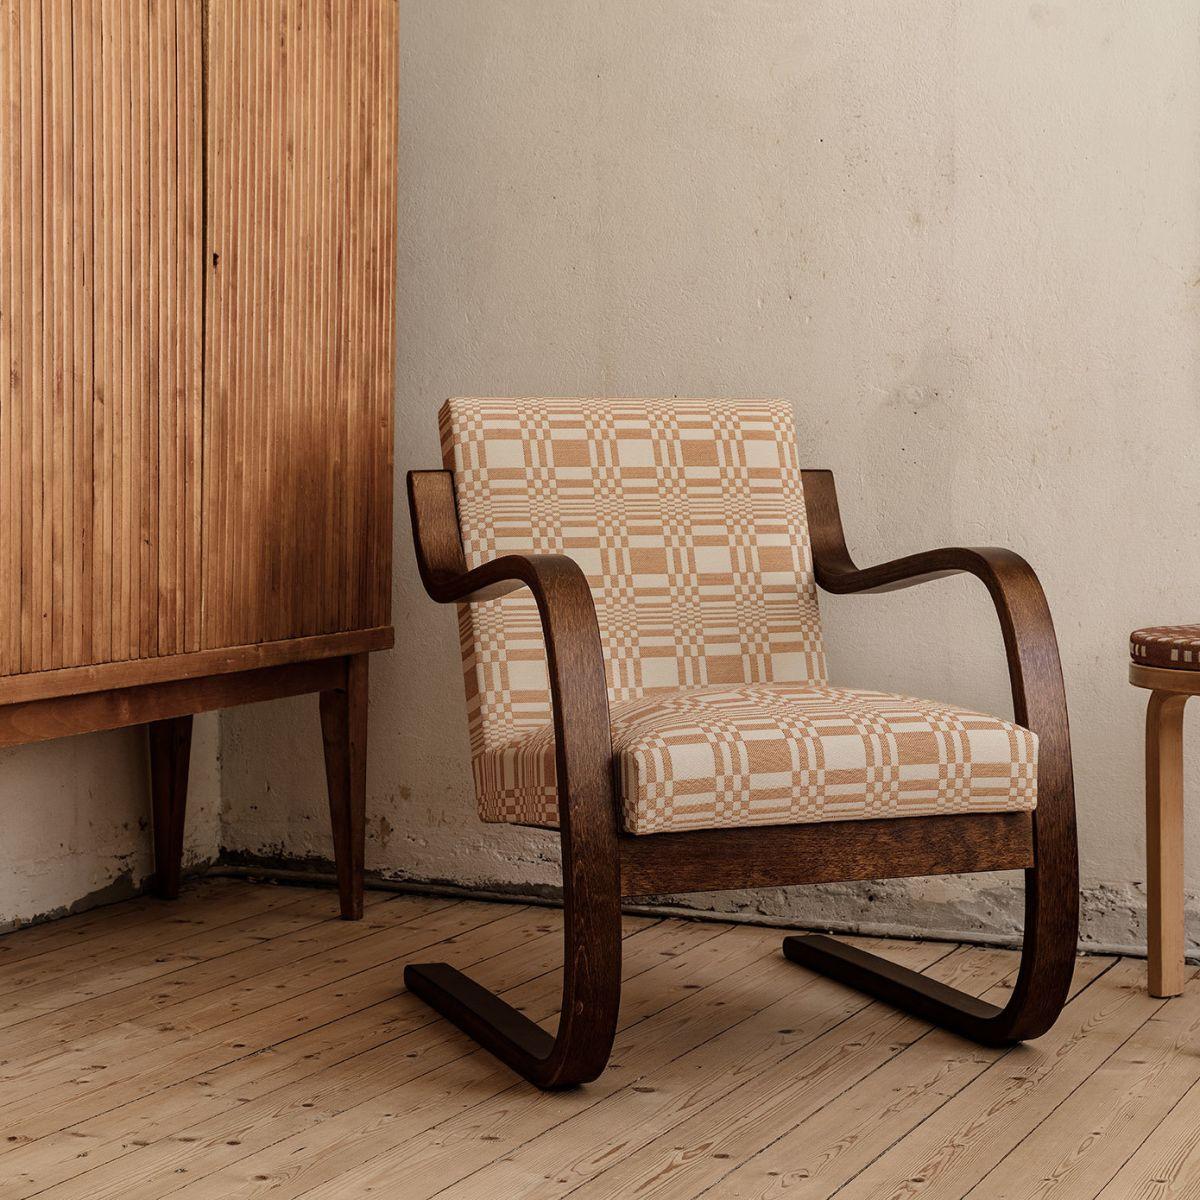 Johanna-Gullichsen-Doris-corall-upholstery-1_web